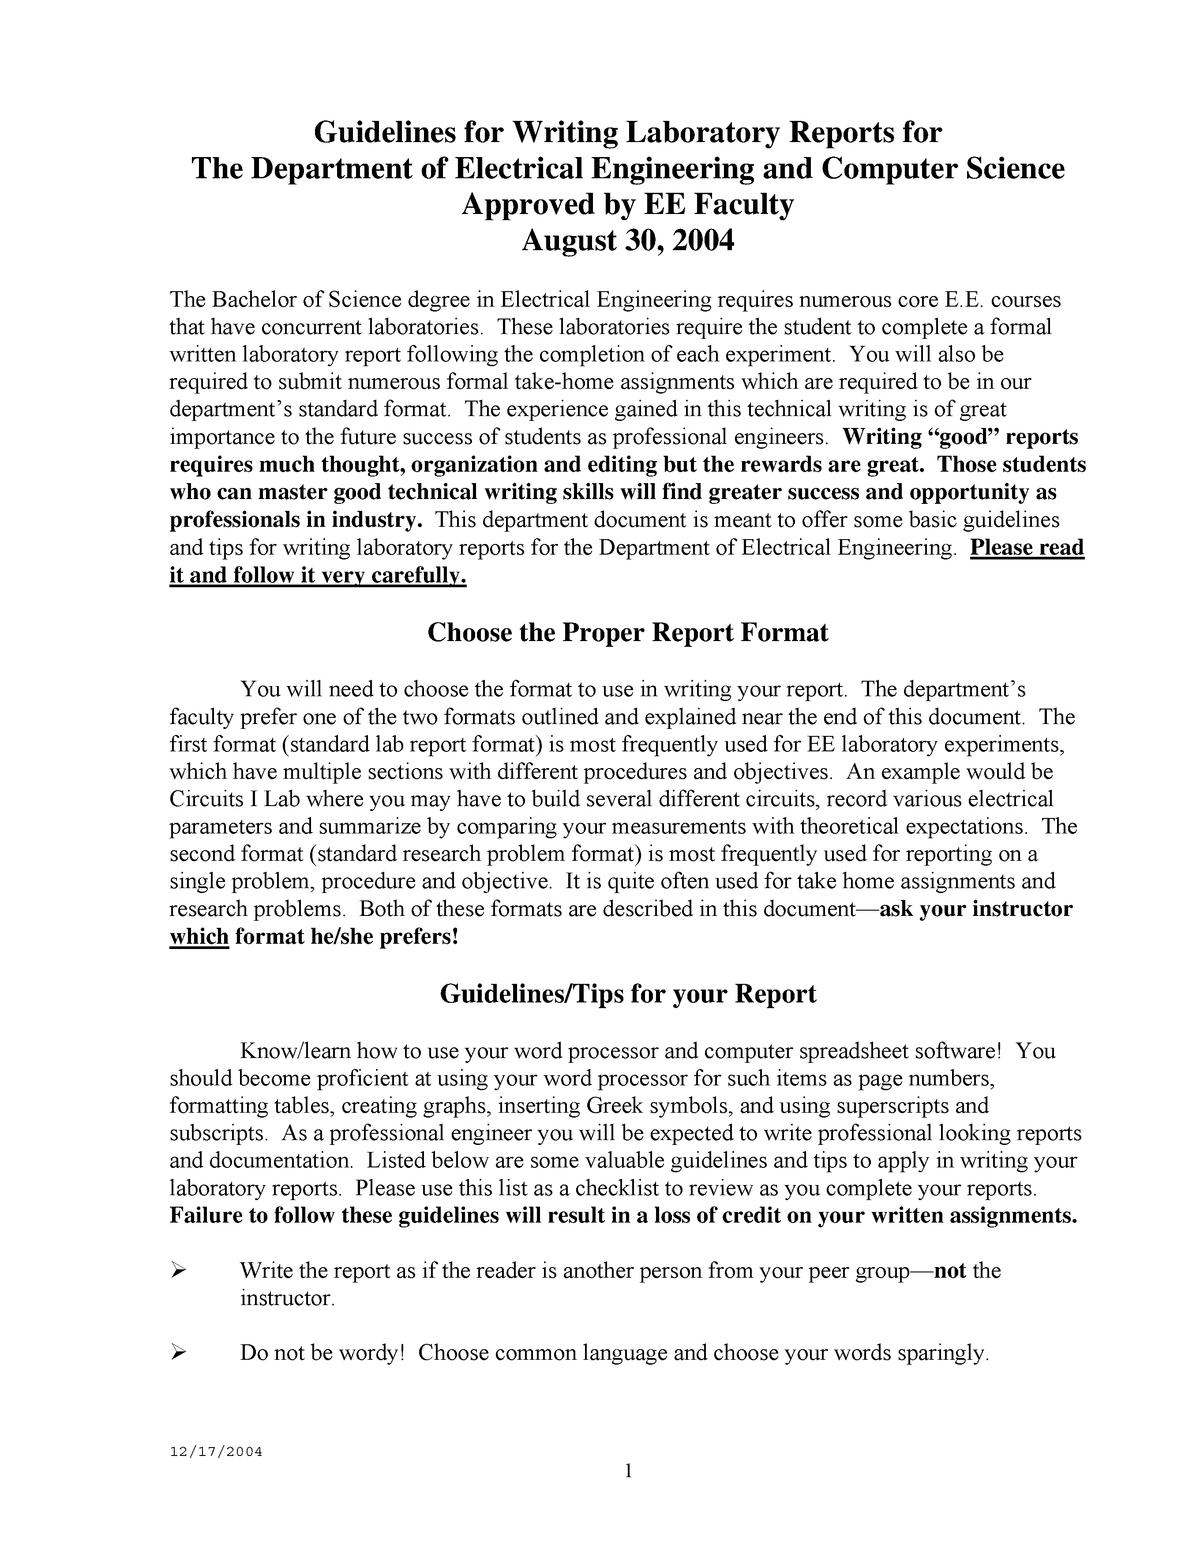 Lab Report Format - Ecte290 - Uow - Studocu In Engineering Lab Report Template